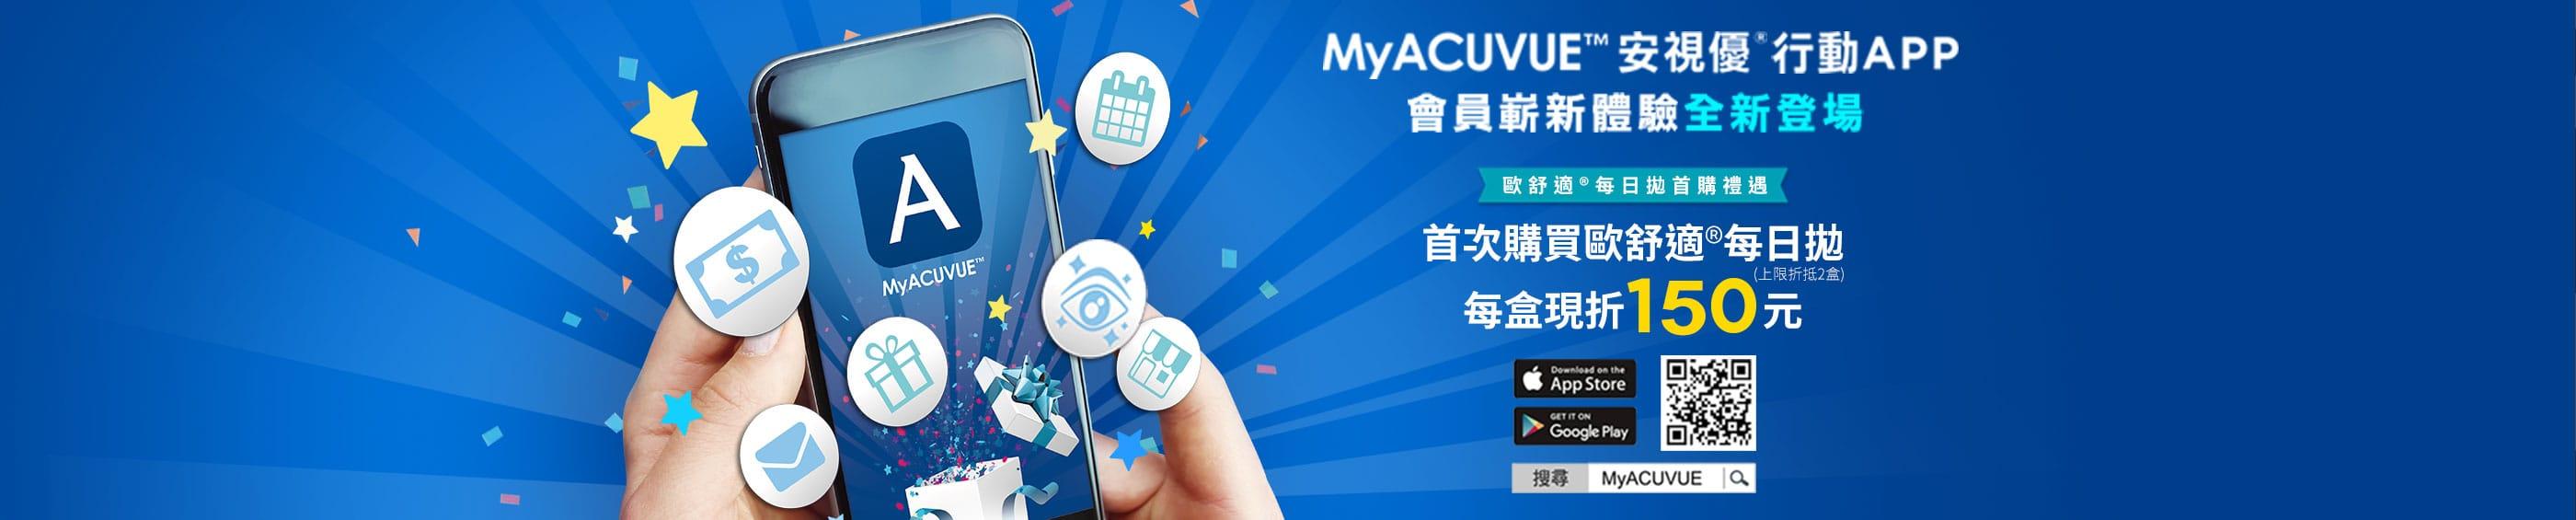 MyACUVUETM安視優®行動APP 會員嶄新體驗全新登場